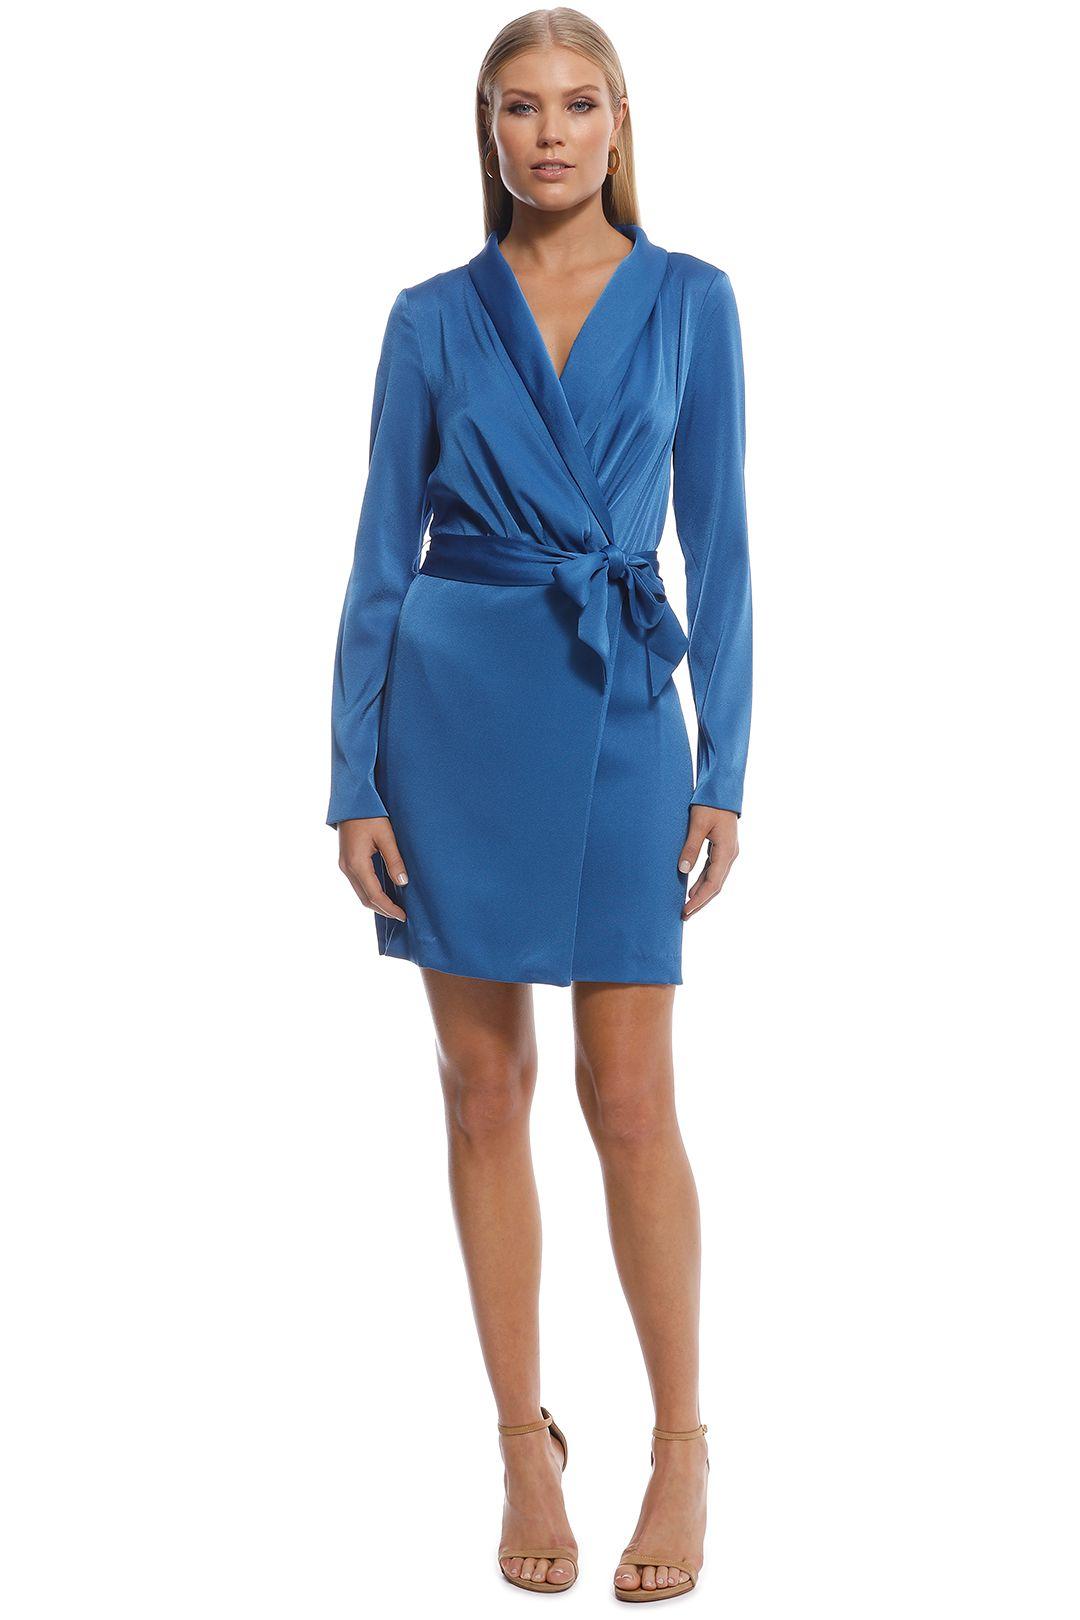 Kookai - Majestic Wrap Dress - Blue - Front